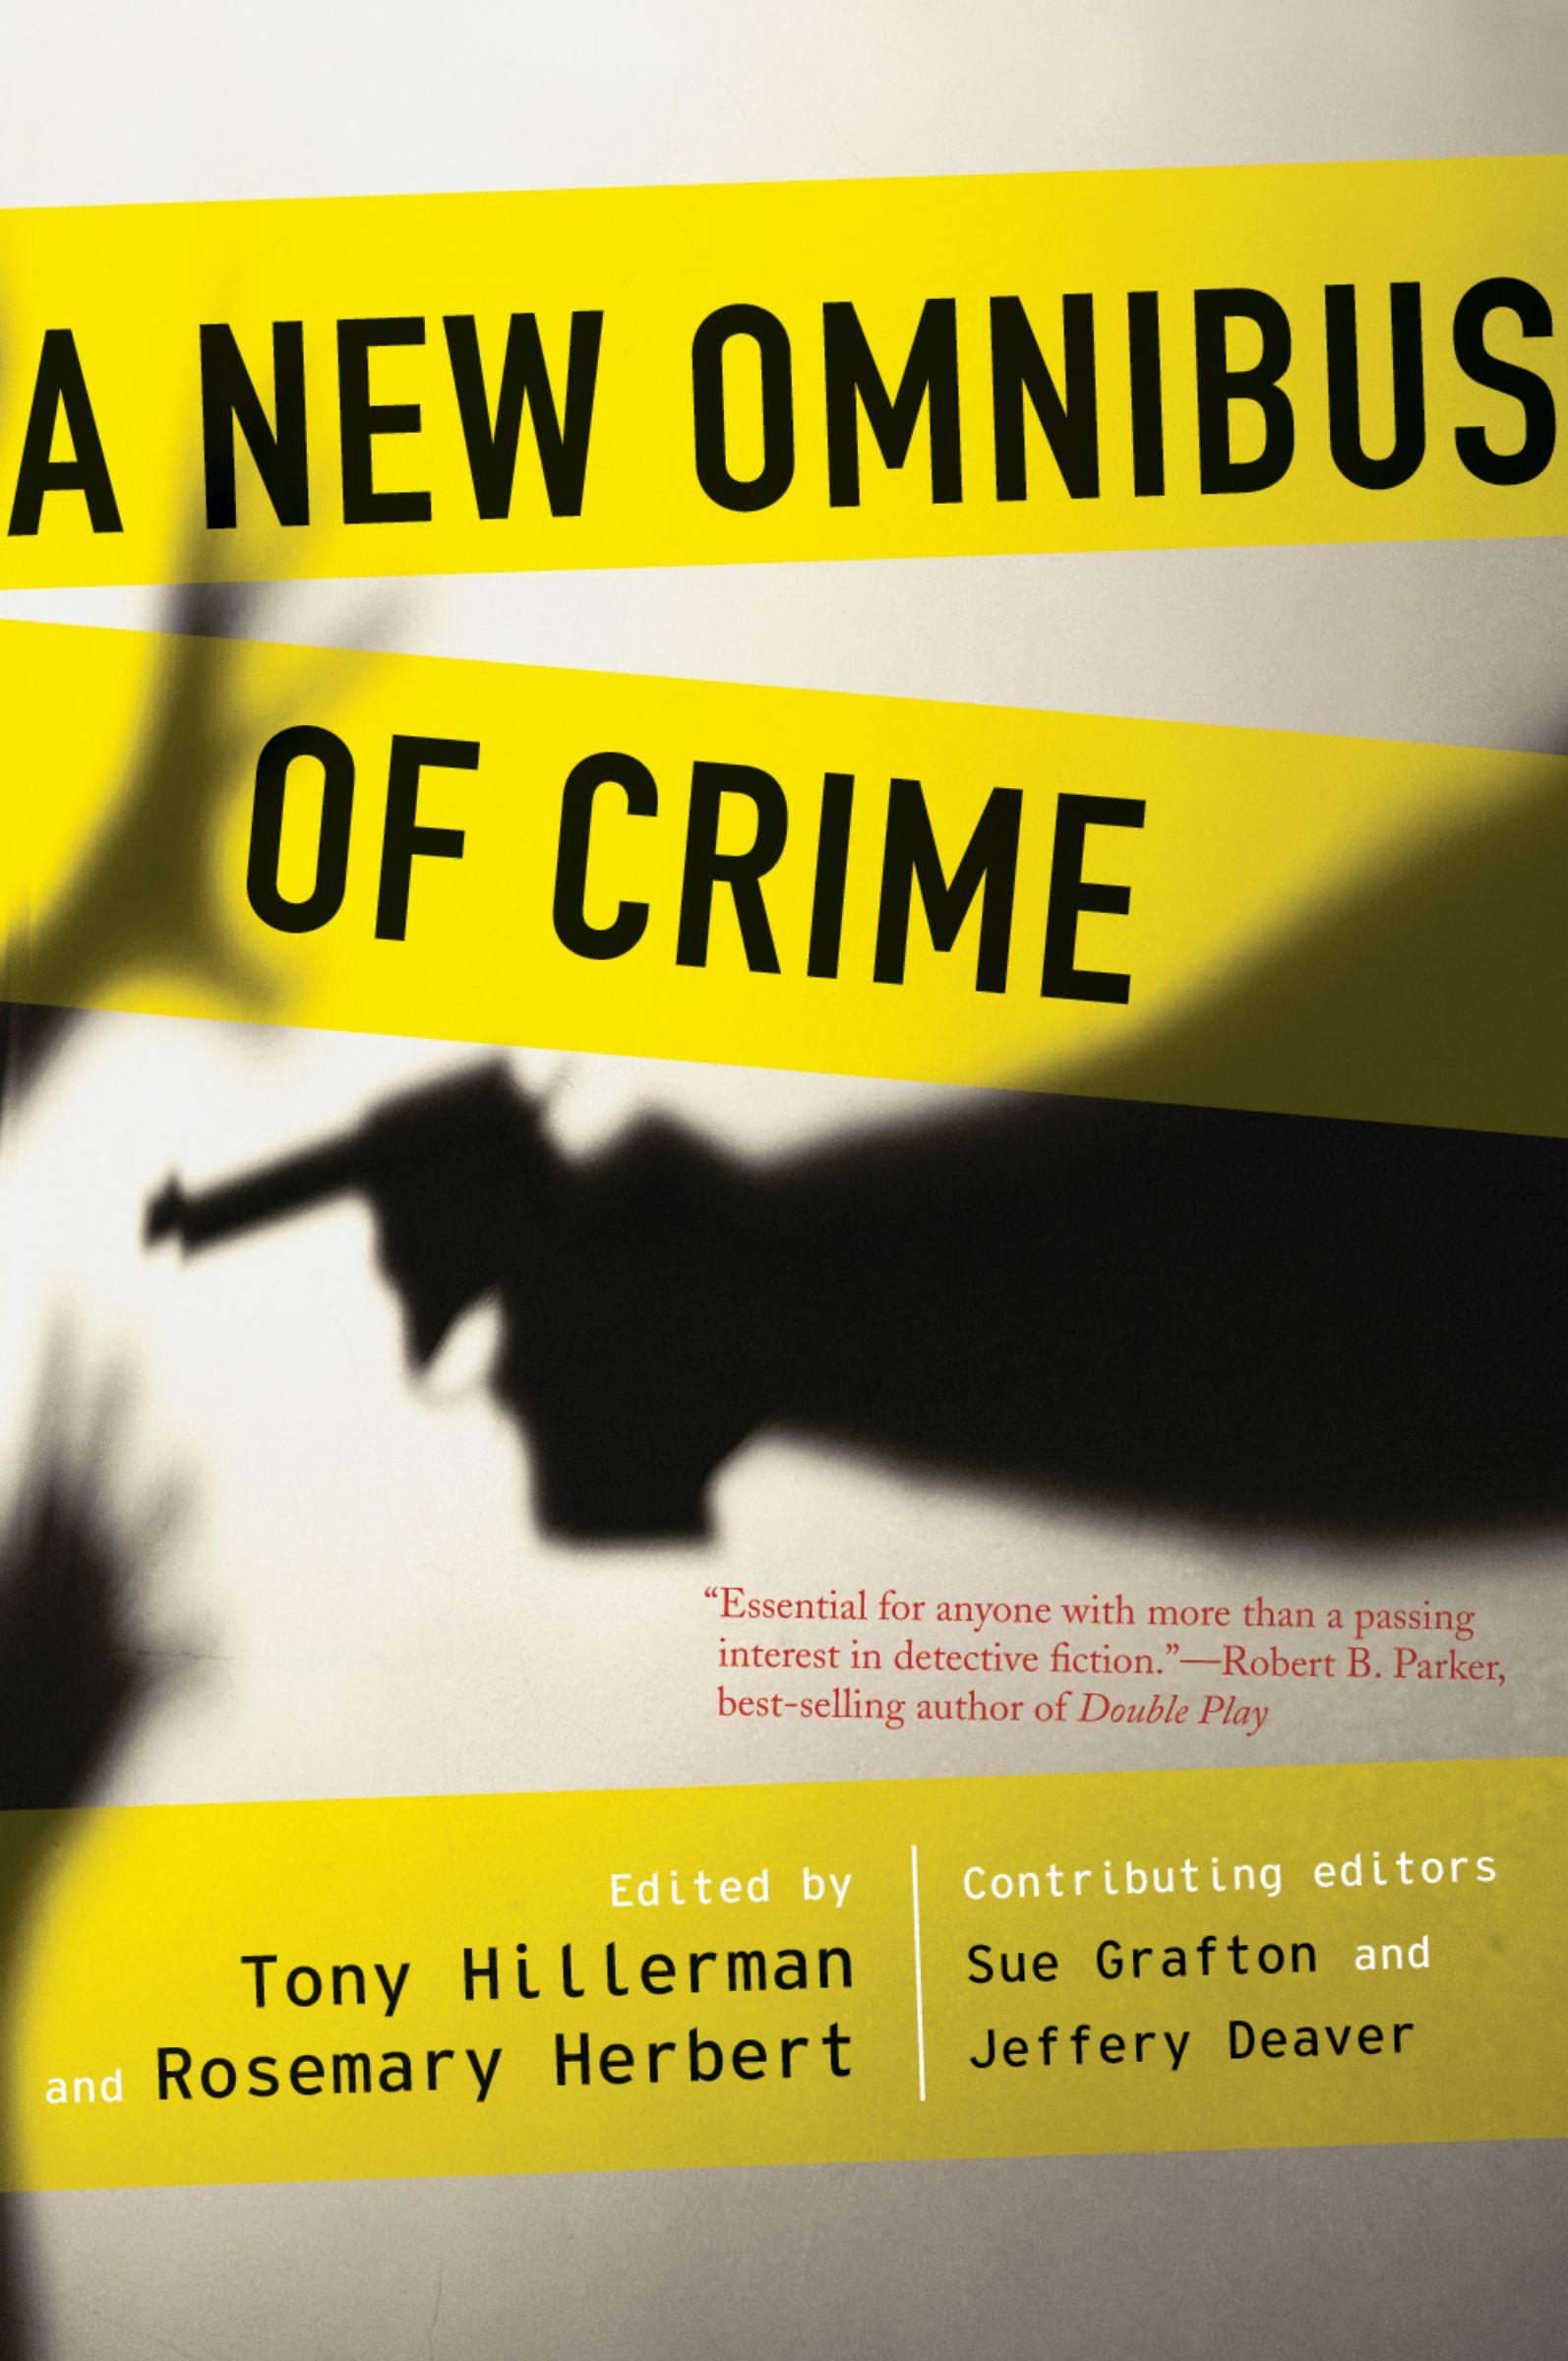 A New Omnibus of Crime (2010, Paperback)